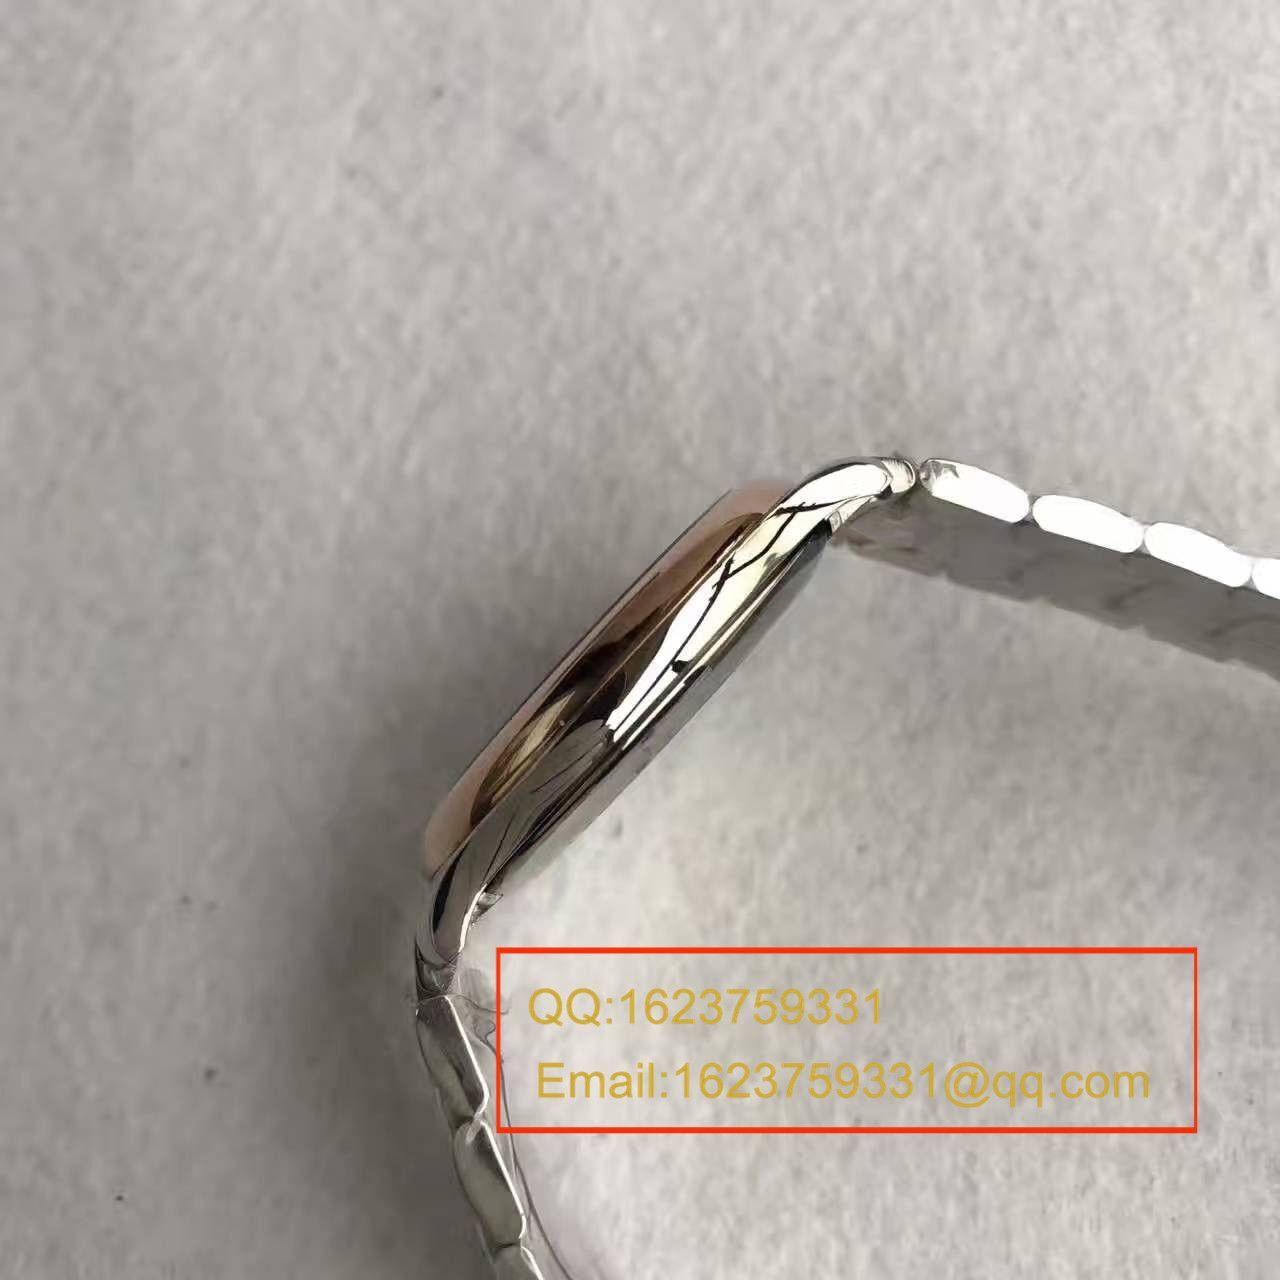 【MK厂一比一超A高仿手表】浪琴MASTER COLLECTION名匠系列L2.628.8.78.3腕表《搭配间金表带》 / L033